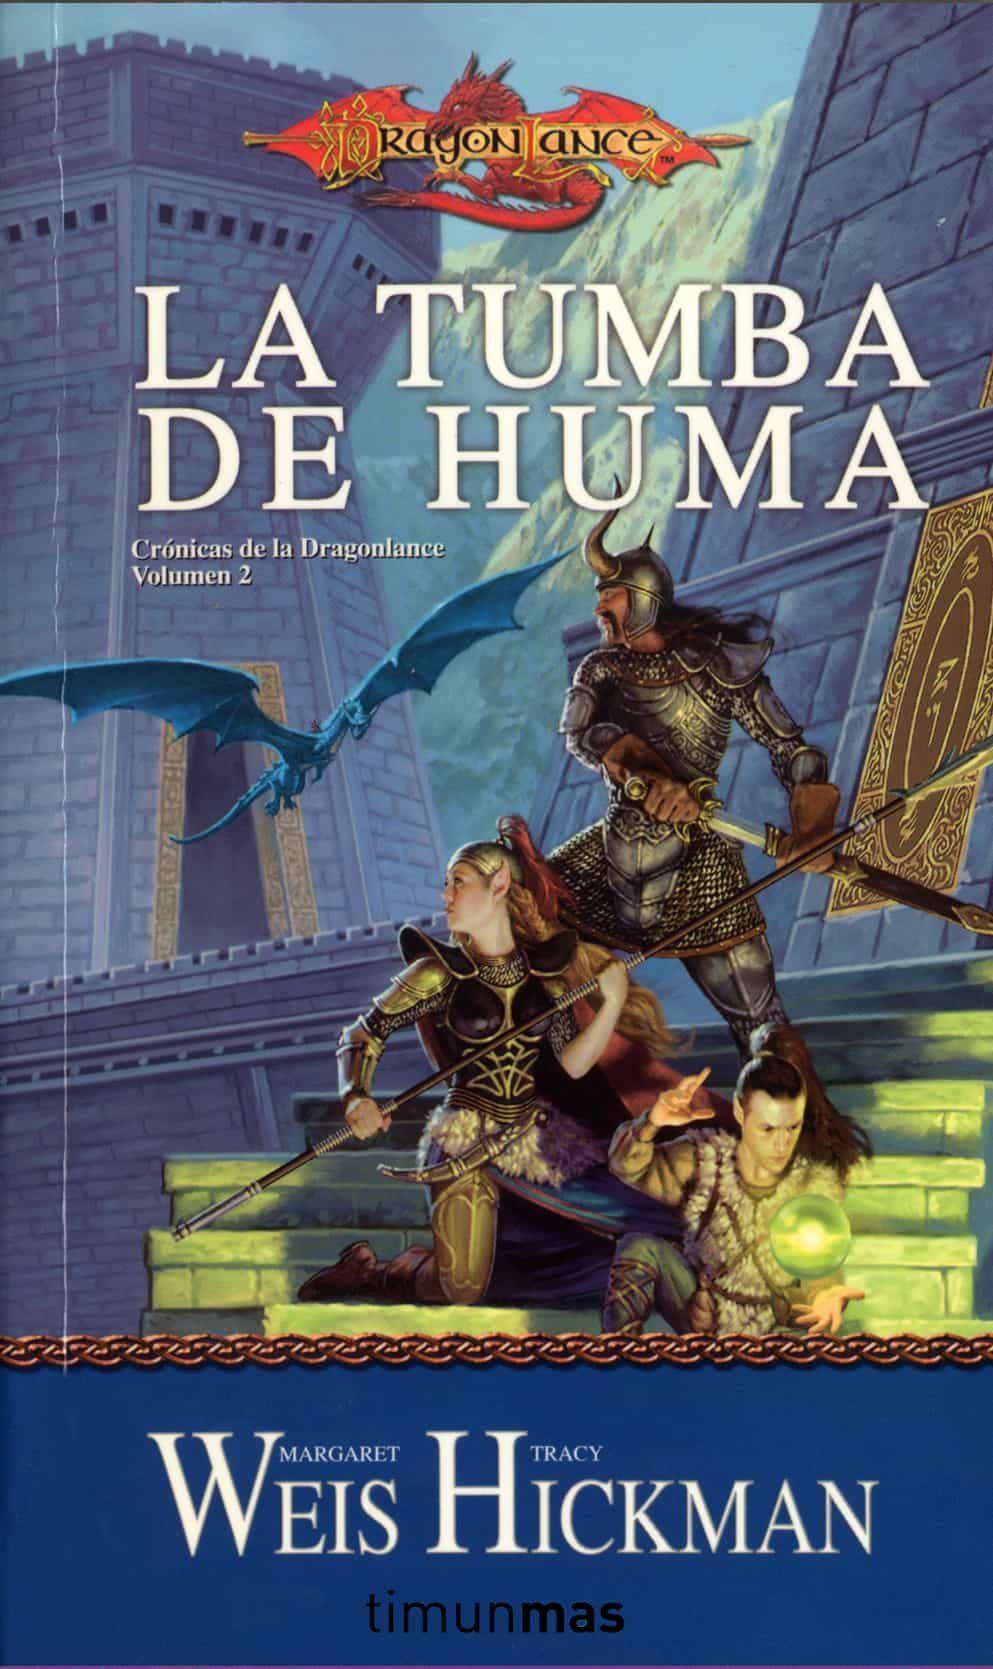 La tumba de huma cronicas dragonlance 2 margaret weis tracy hickman